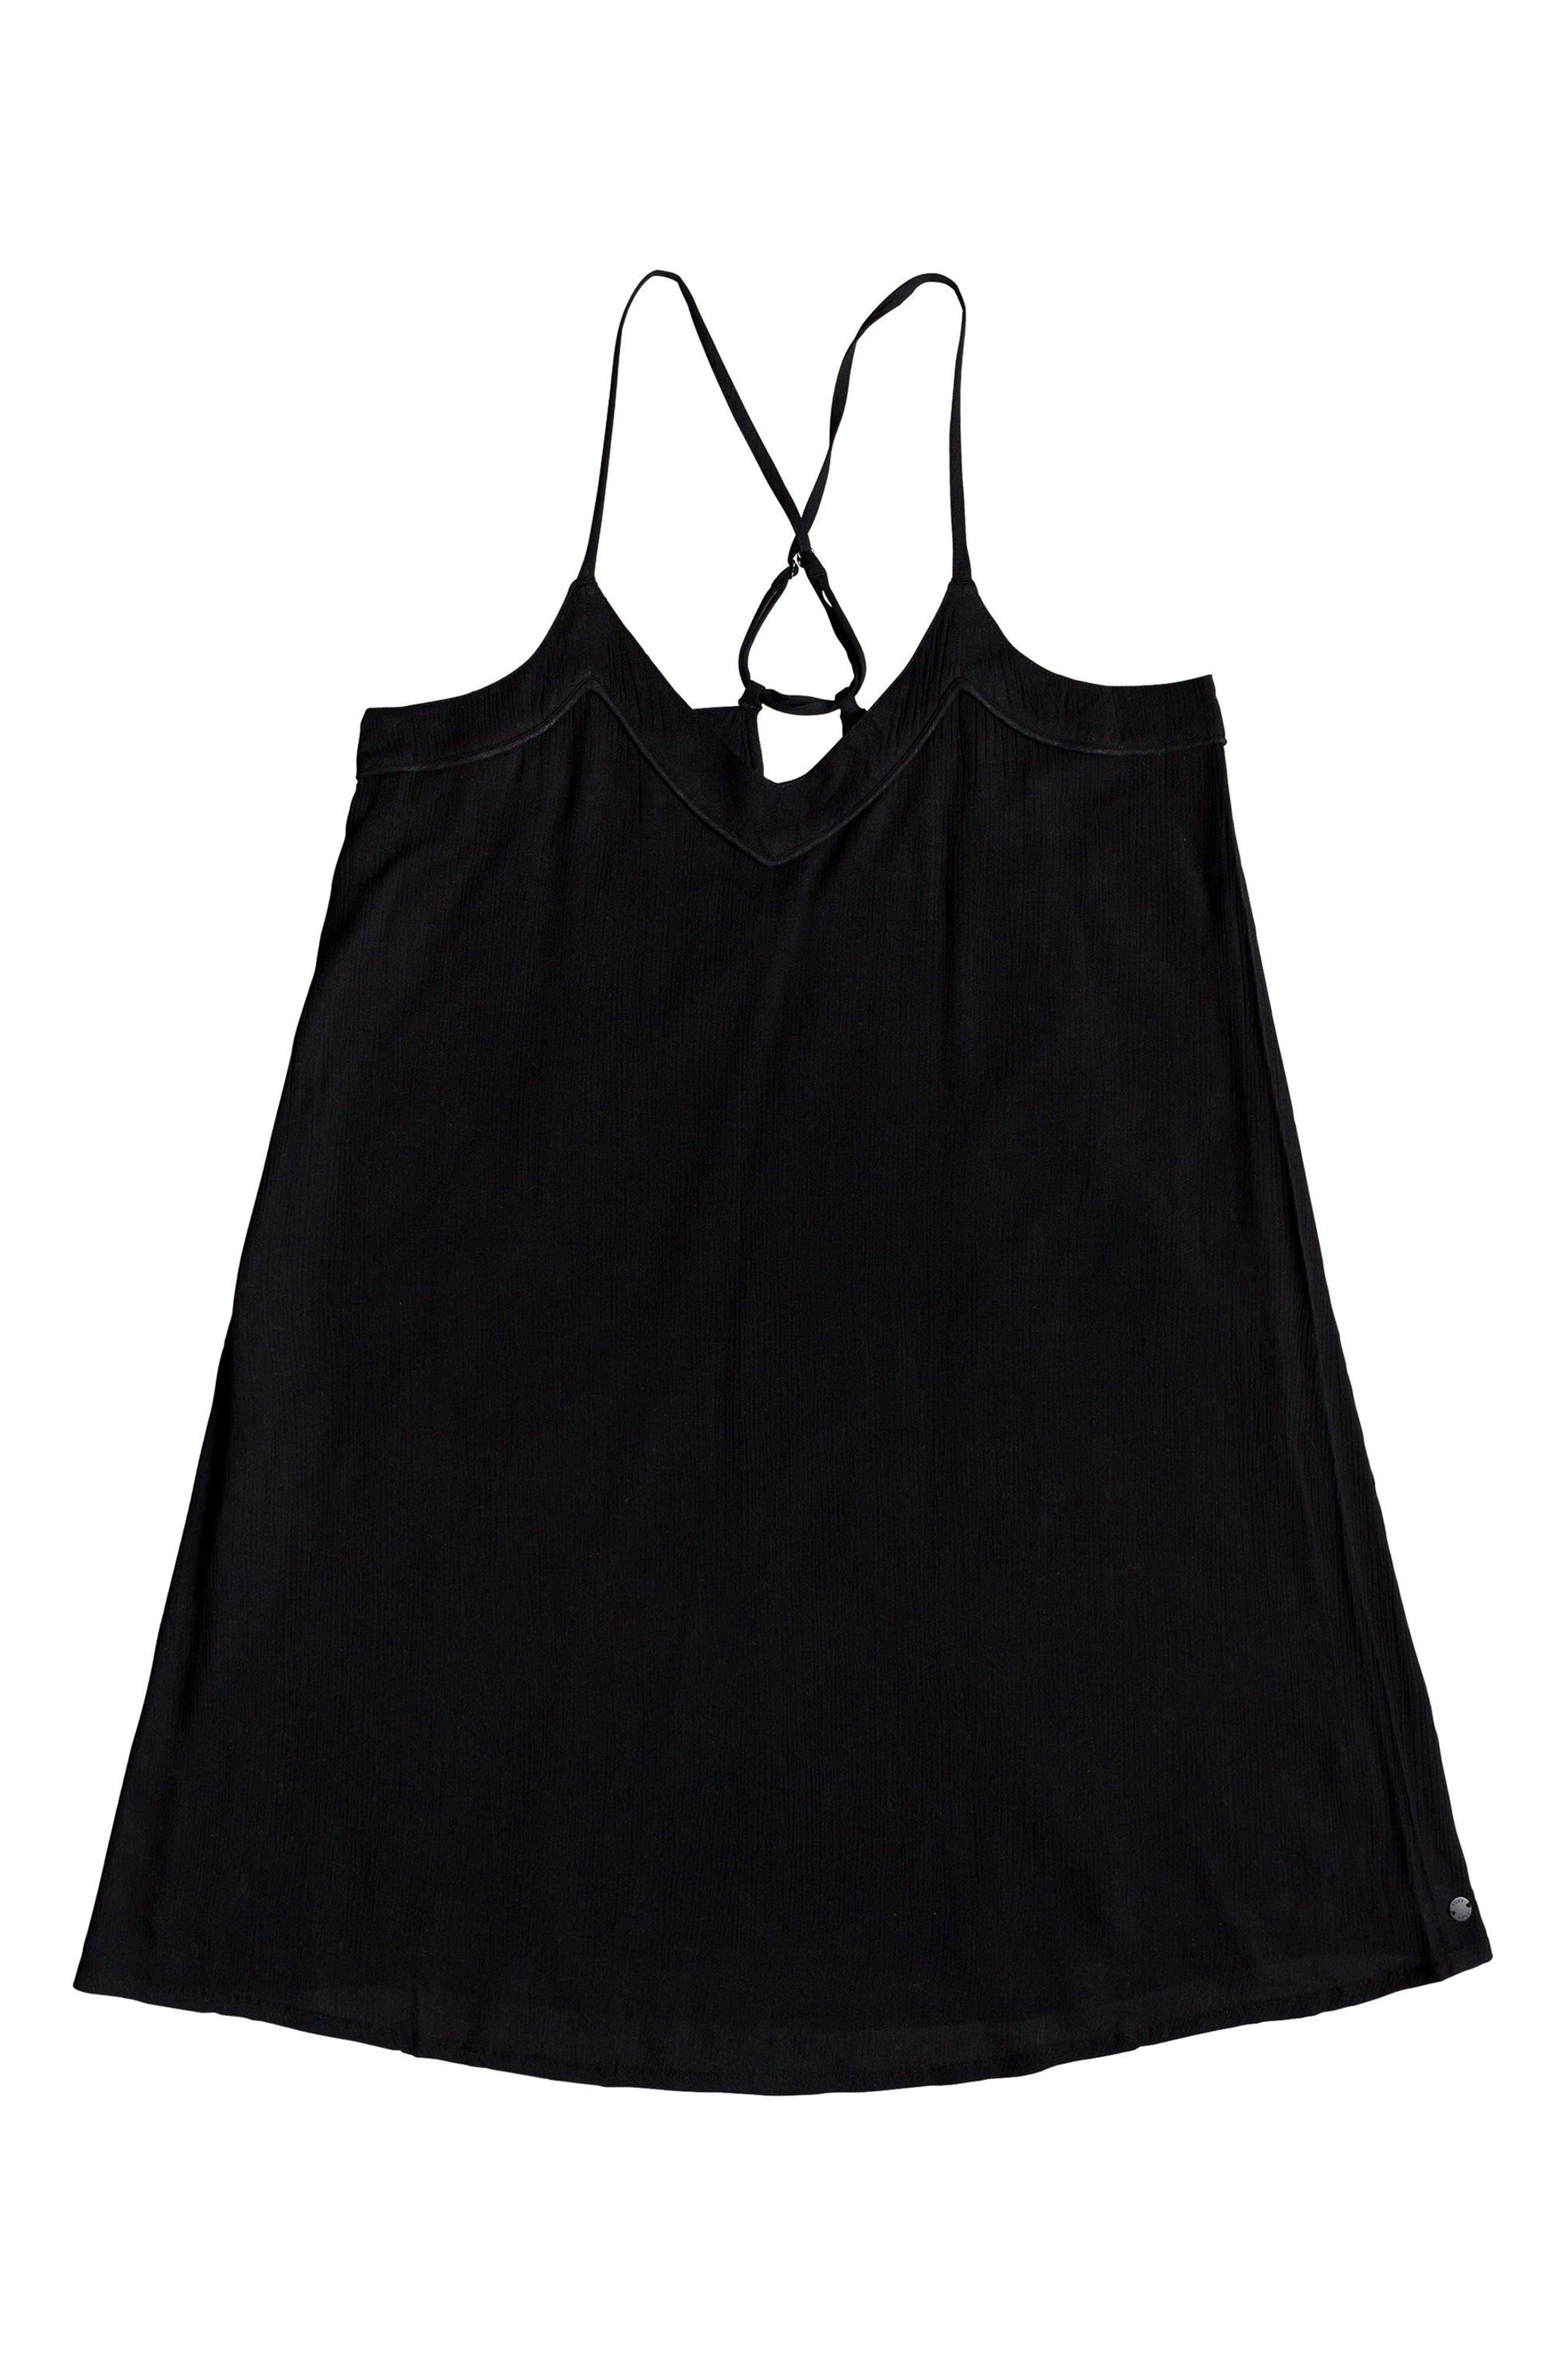 ROXY,                             Off We Go Minidress,                             Alternate thumbnail 3, color,                             TRUE BLACK